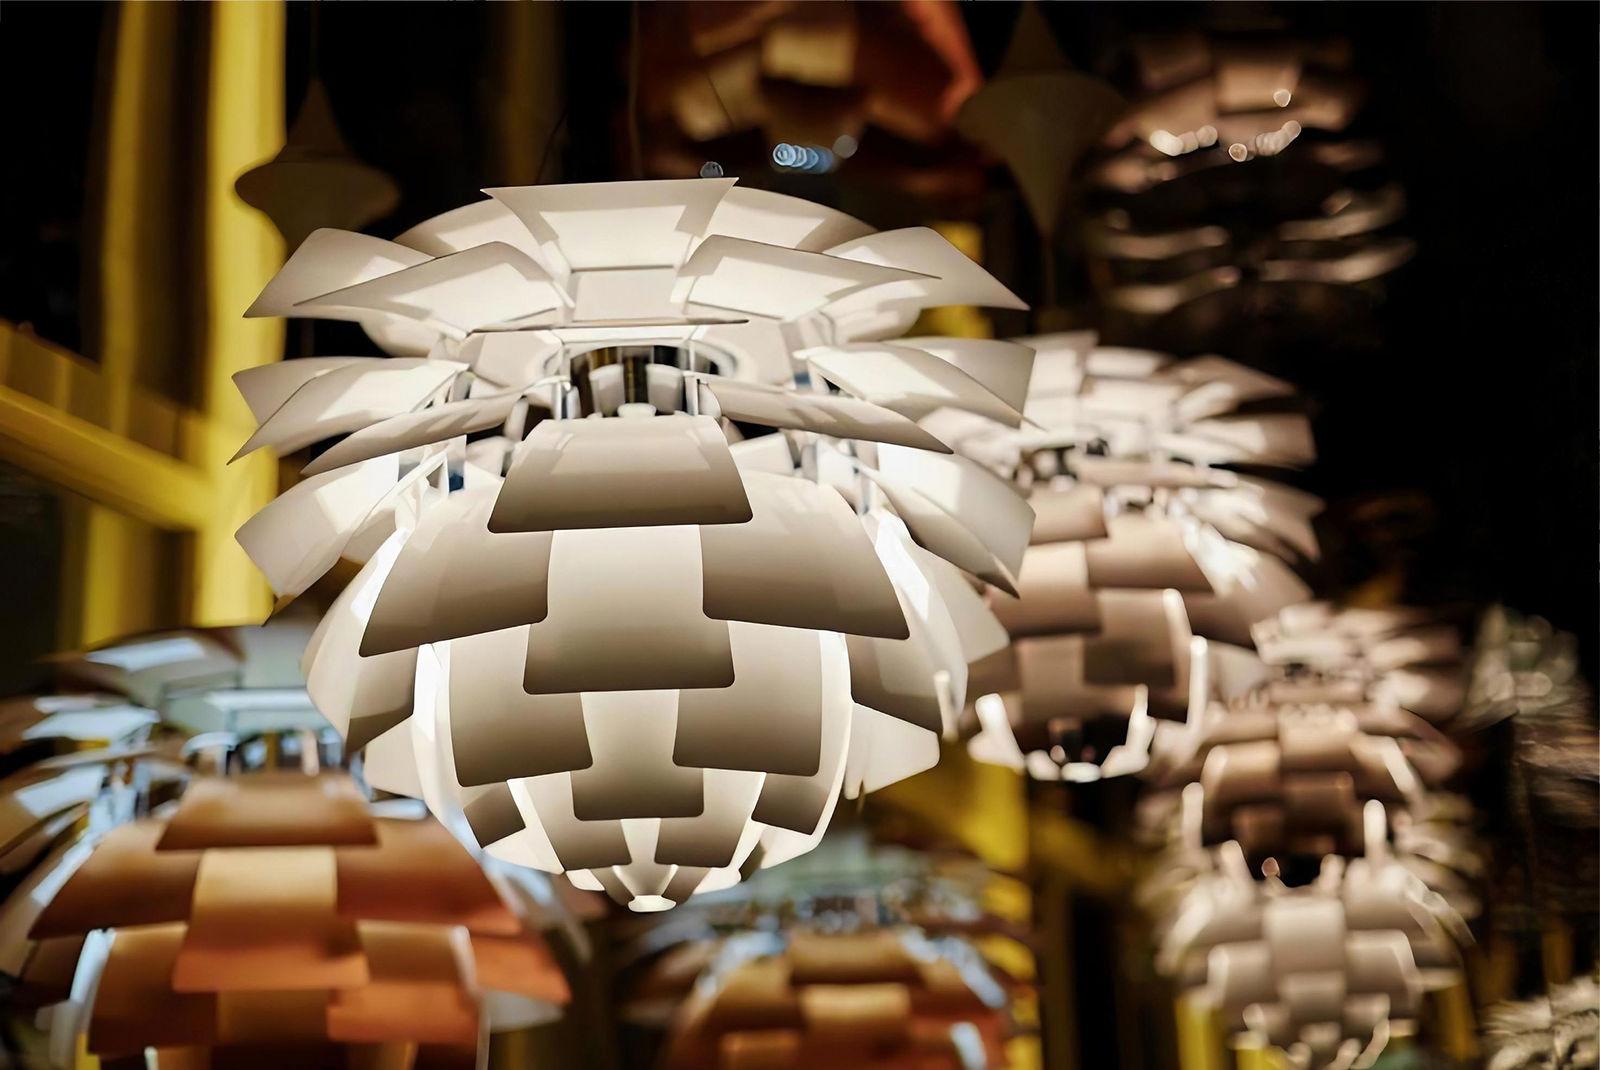 PH Snowball Pendant designed by Poul Henningsen